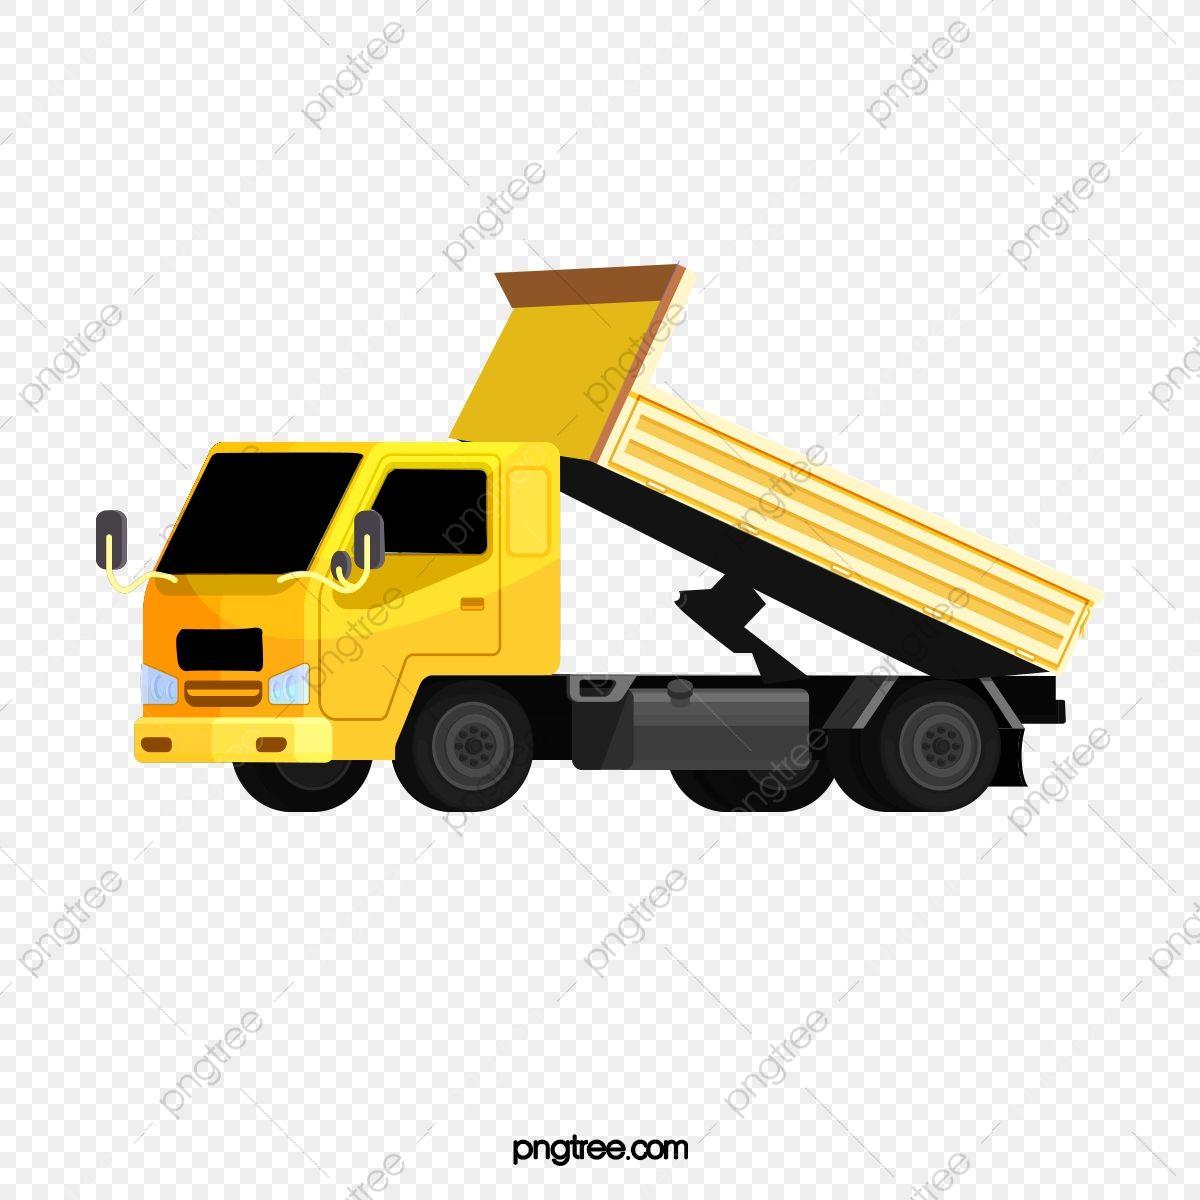 Dump Truck Truck Clipart Truck Png Transparent Clipart Image And Psd File For Free Download Trucks Dump Truck Clip Art